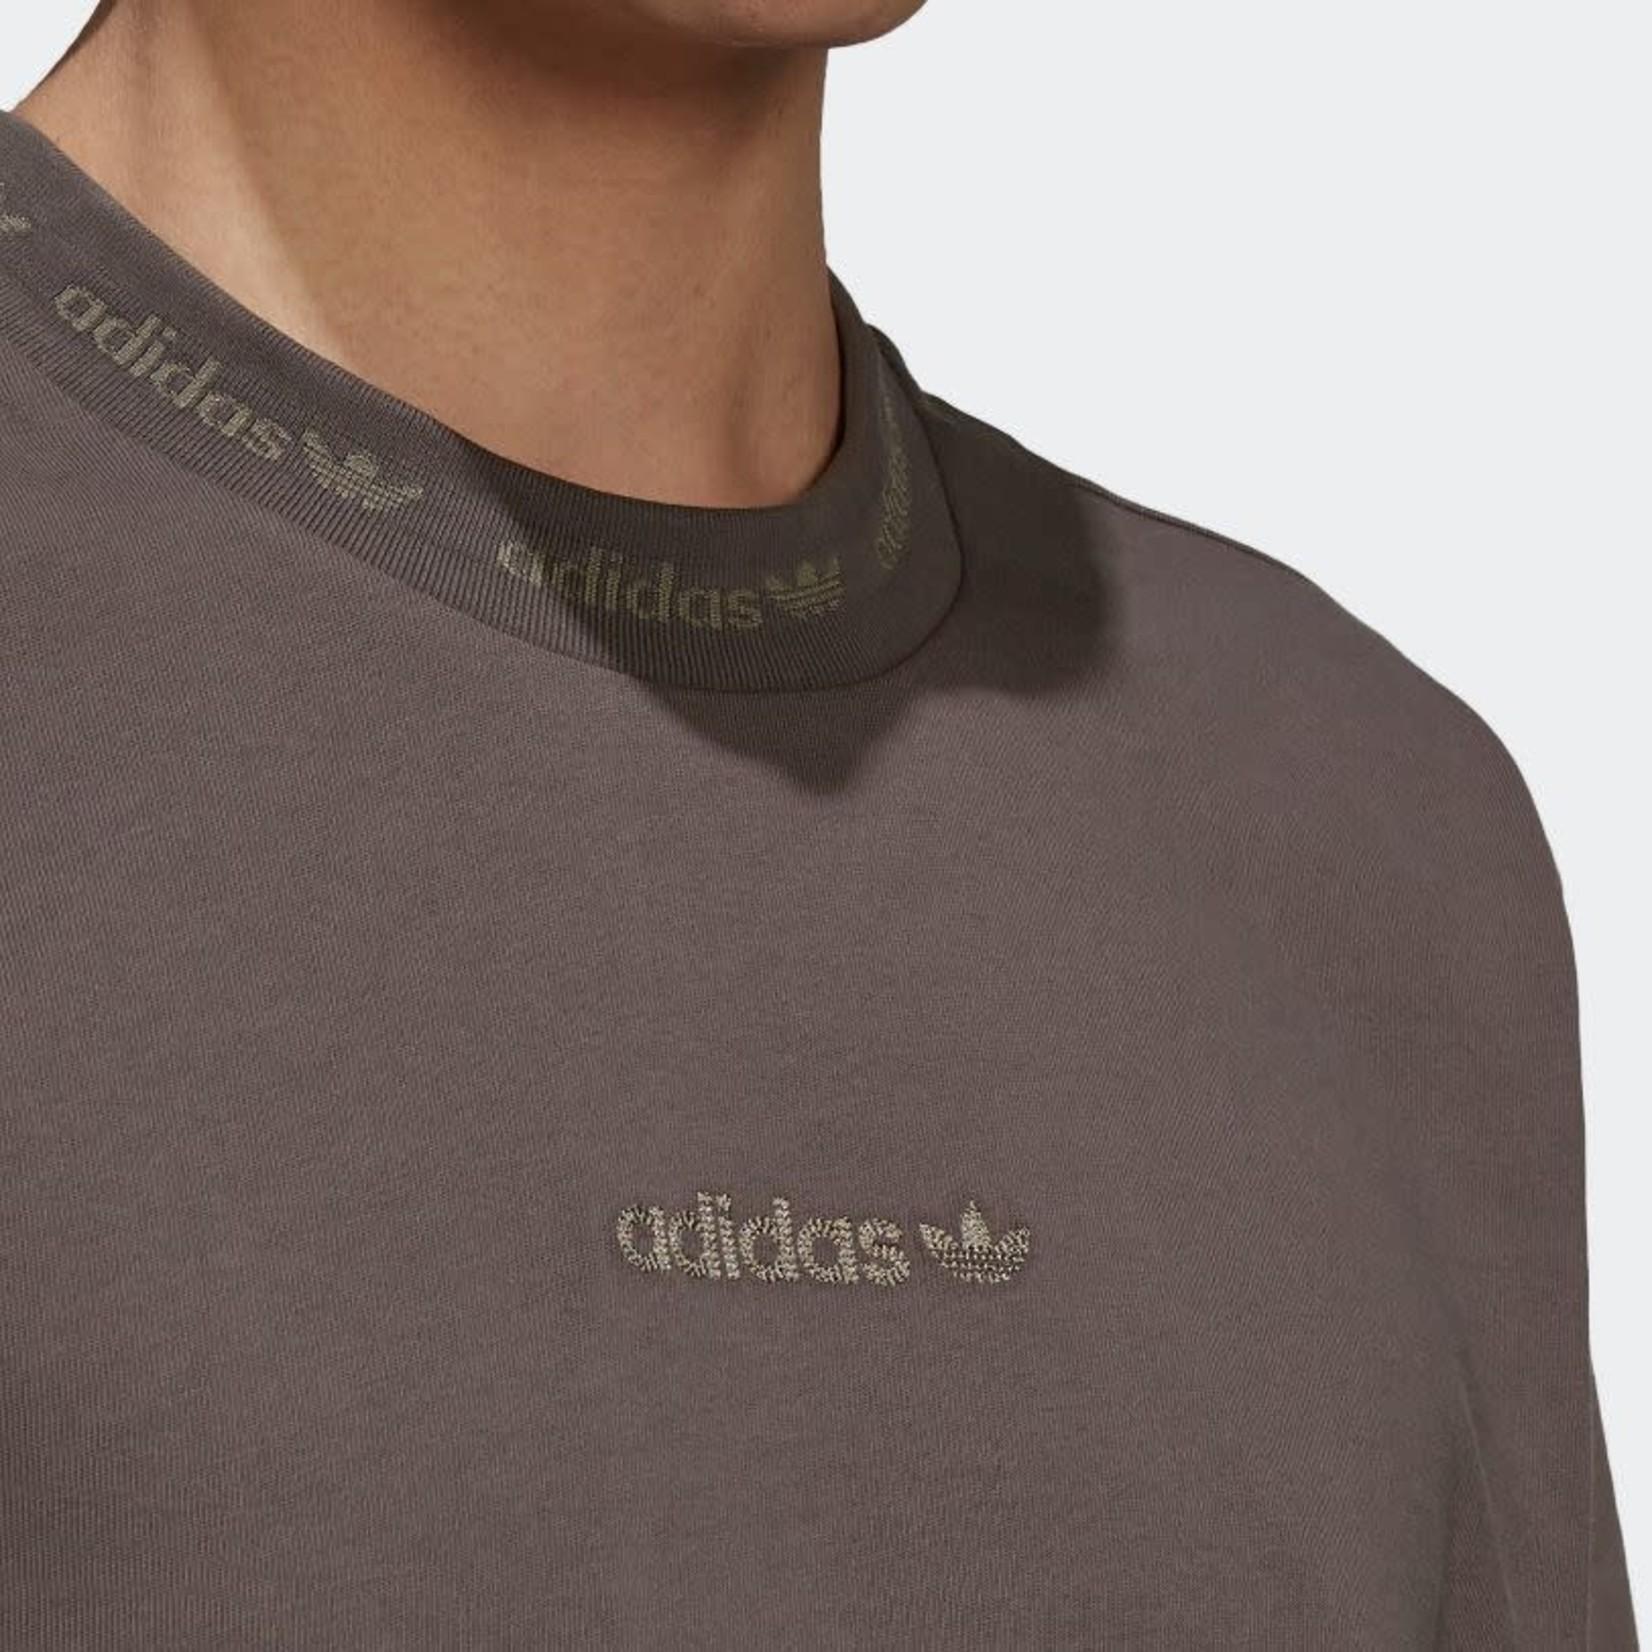 Adidas Adidas : Rib Detail Short Sleeve Tee